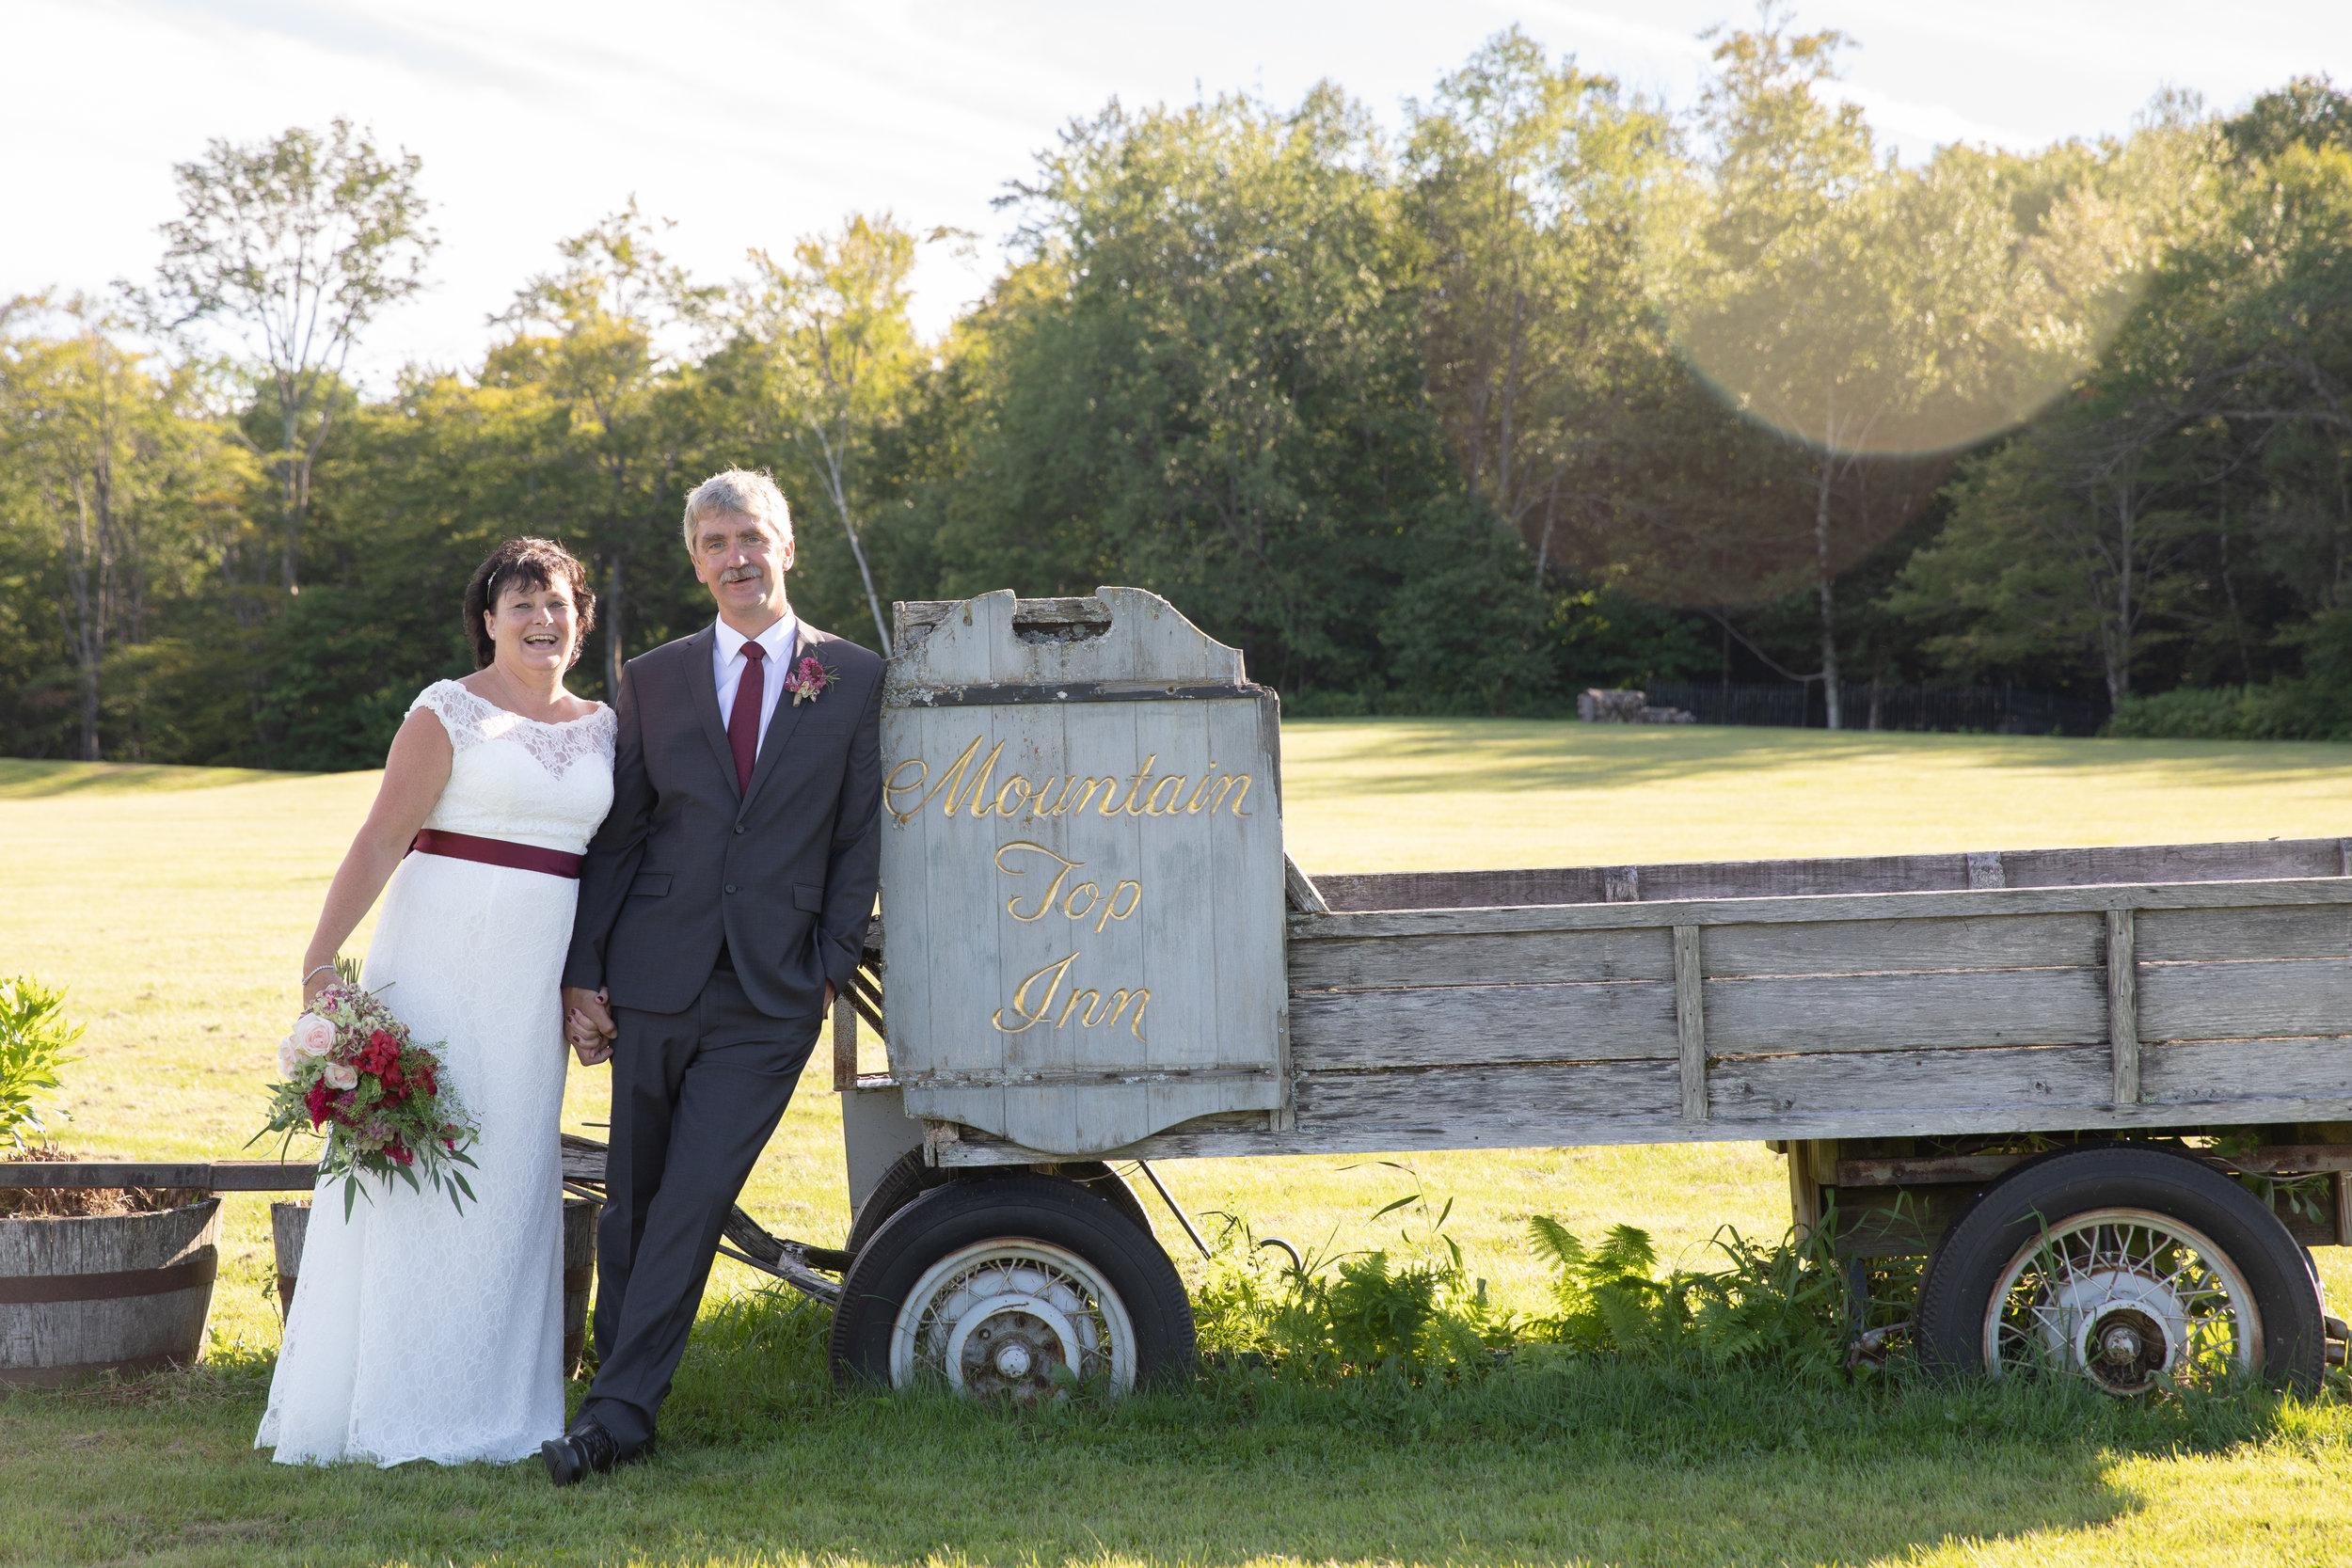 Denise & Ted - August 10, 2018 @  Mountain Top Inn & Resort  - Chittenden, Vermont